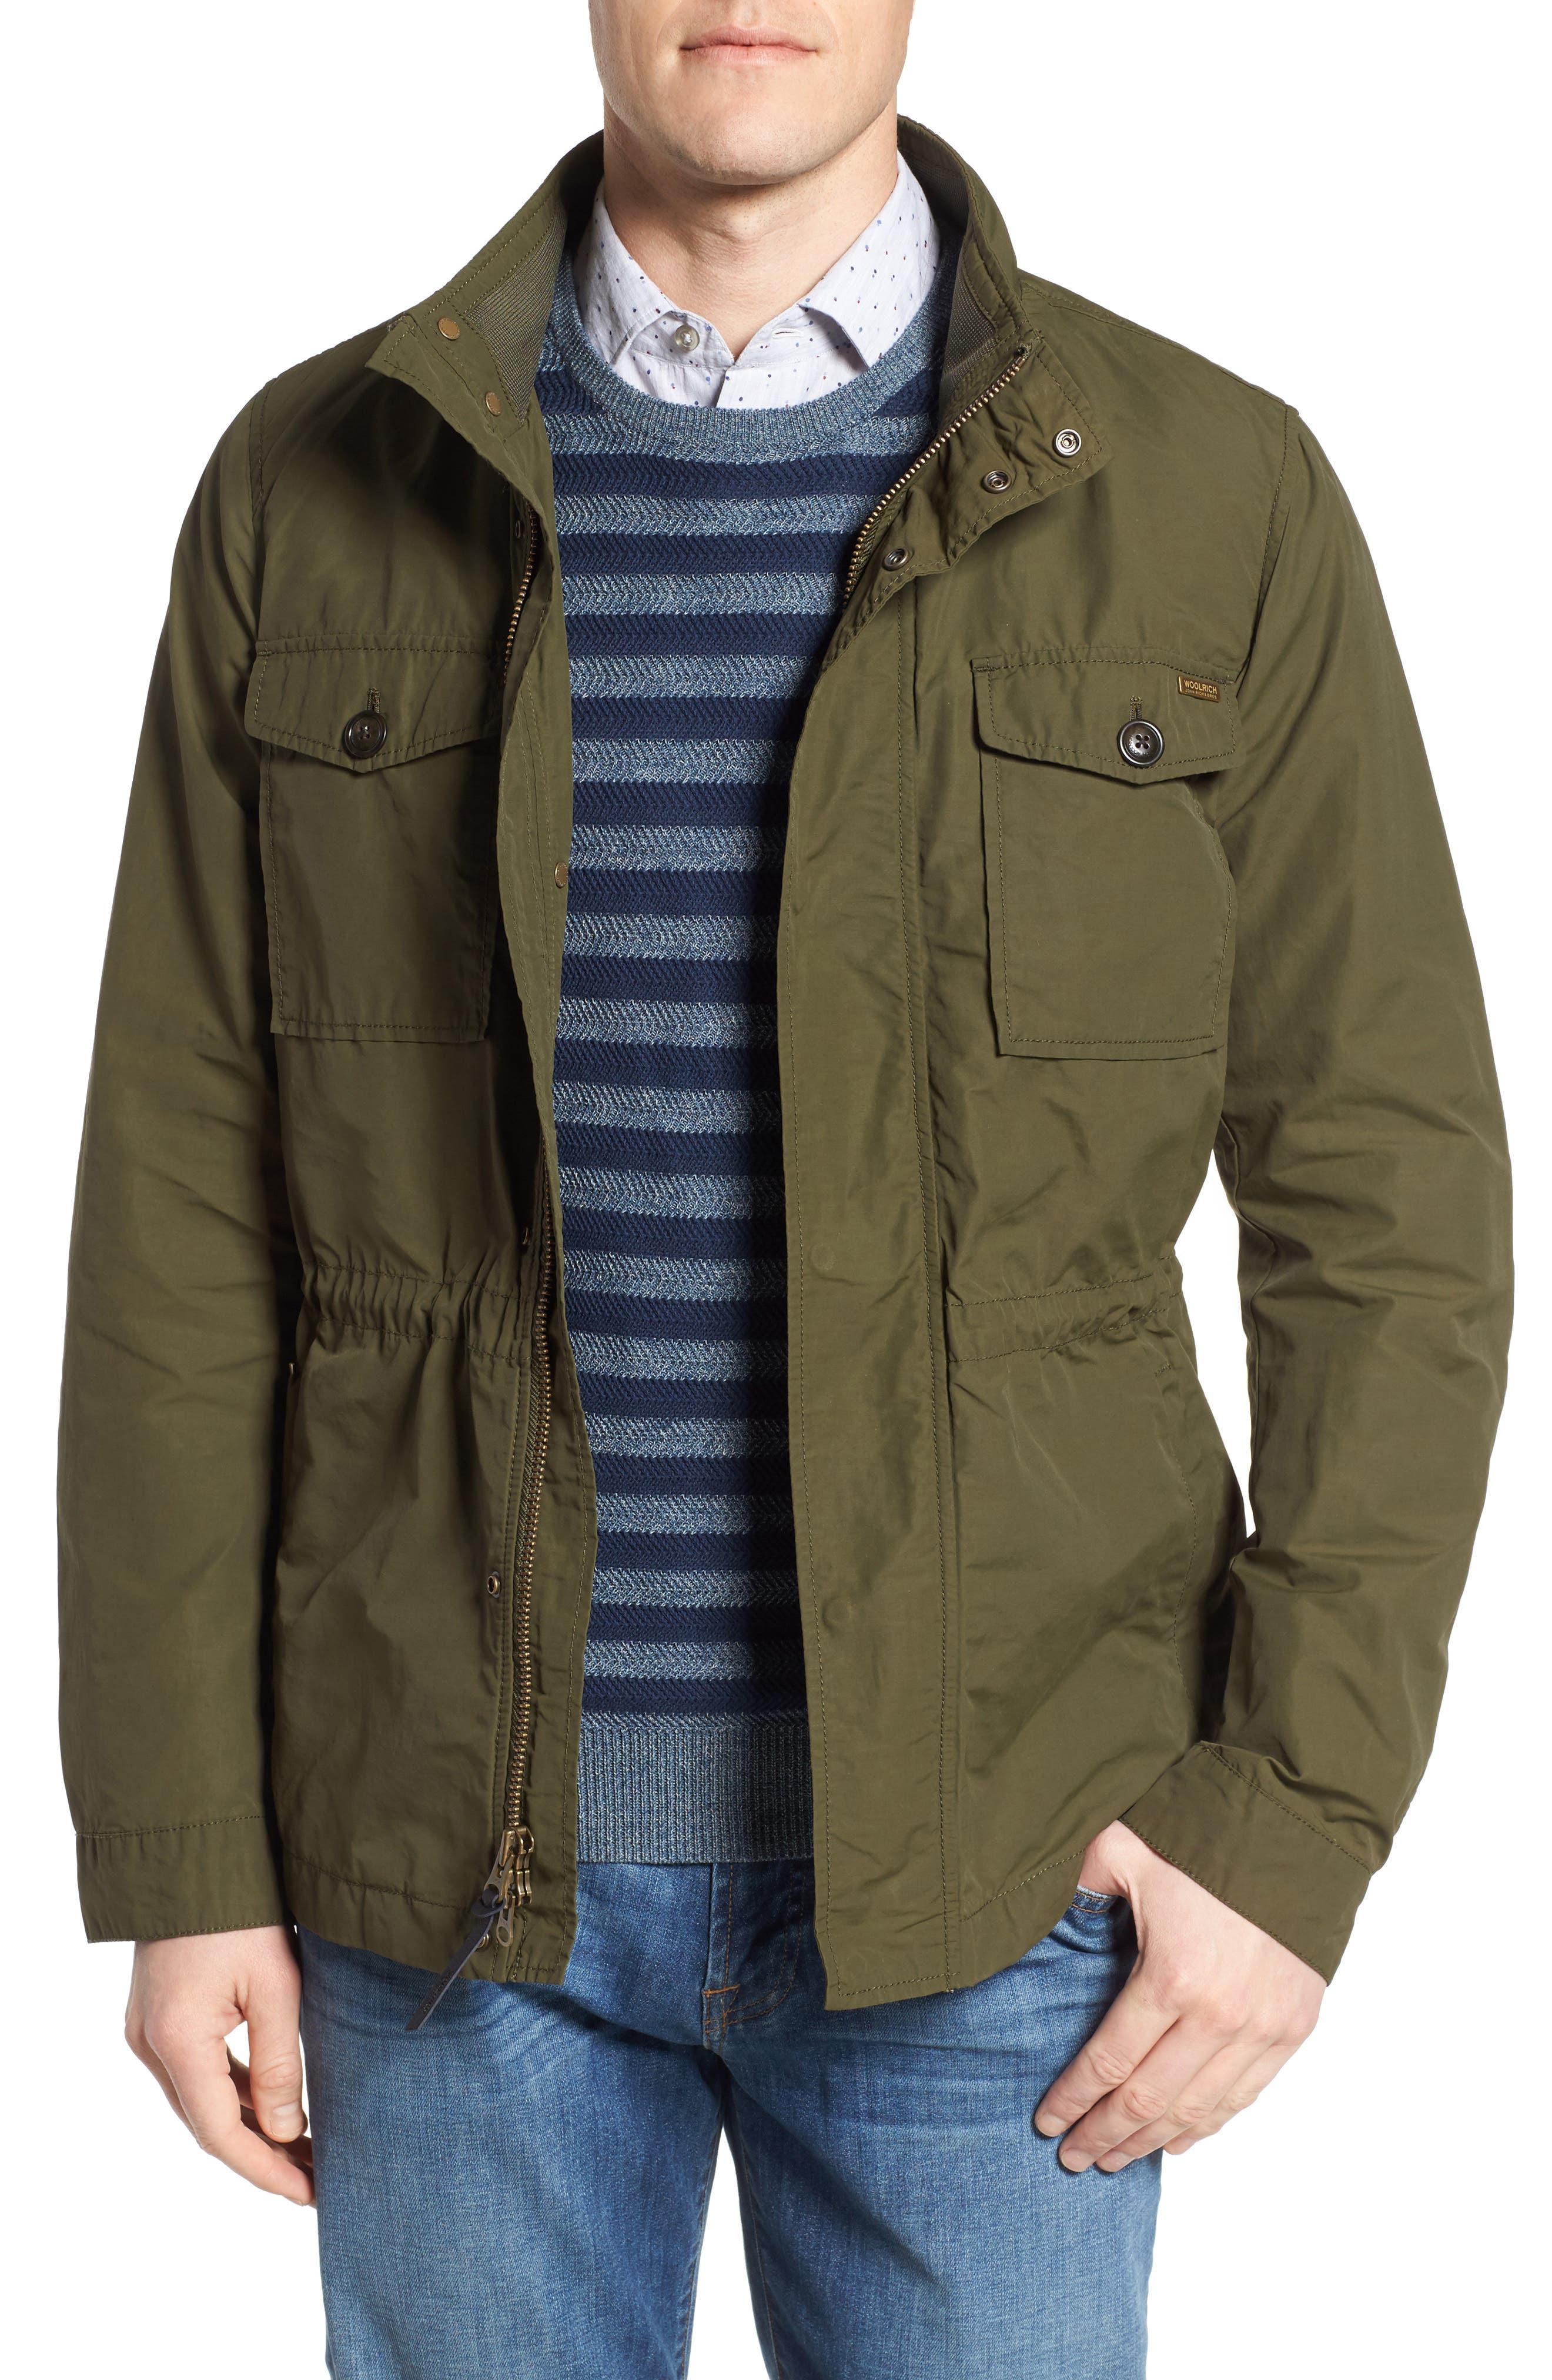 Alternate Image 1 Selected - Woolrich John Rich Military Field Jacket